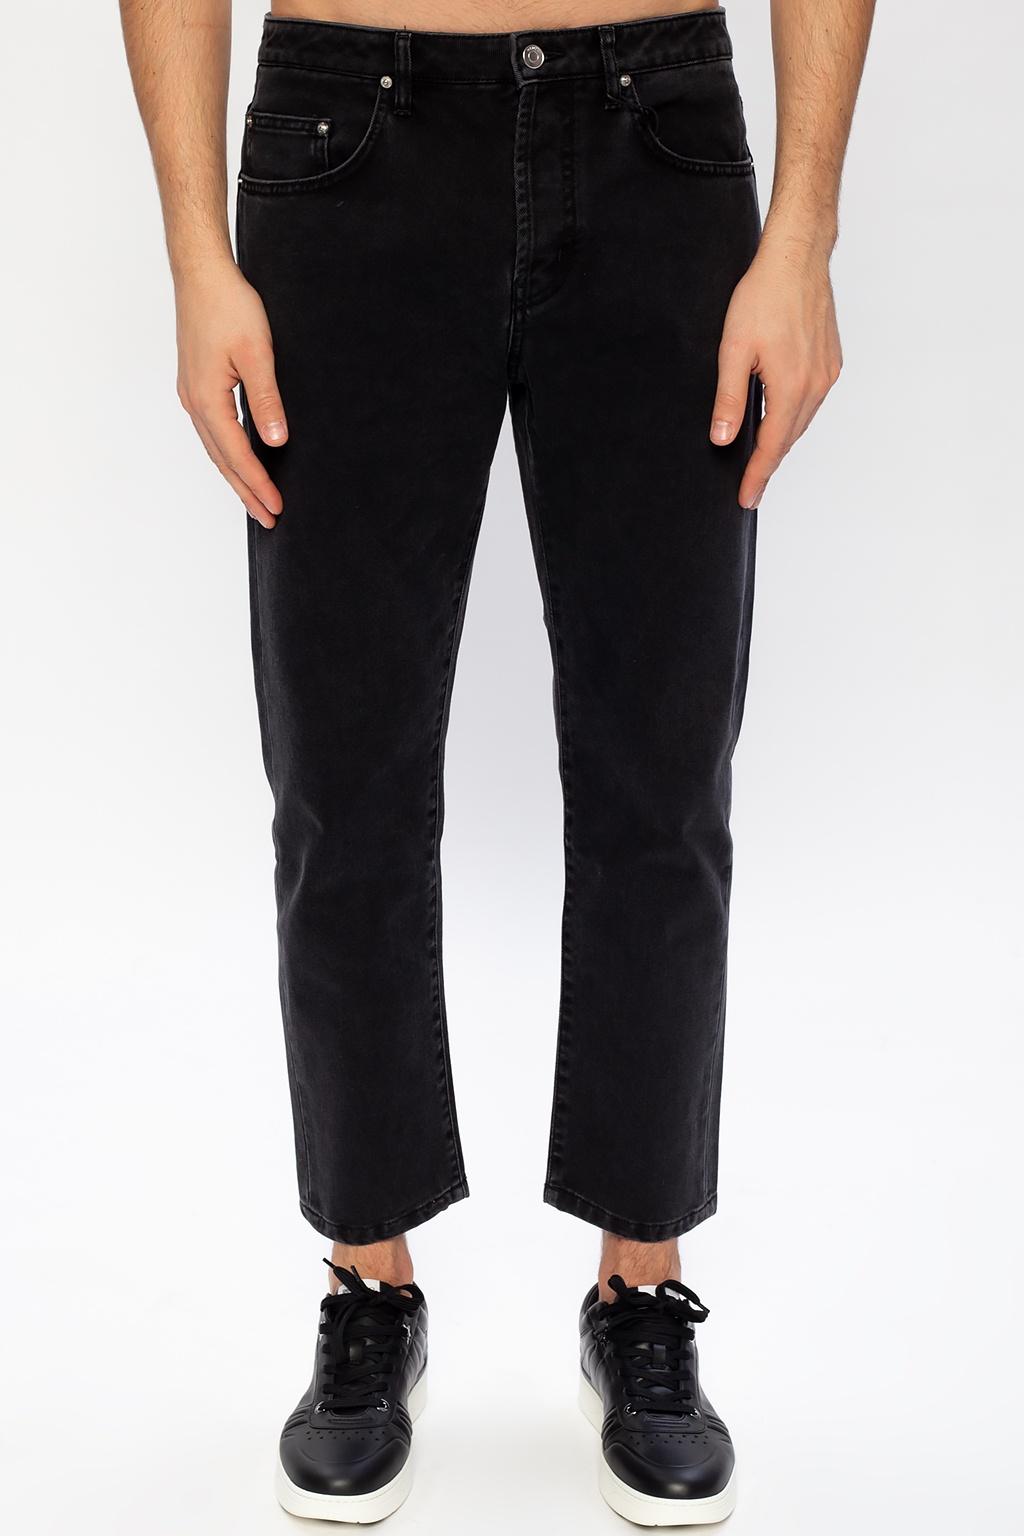 Kenzo Jeans with logo